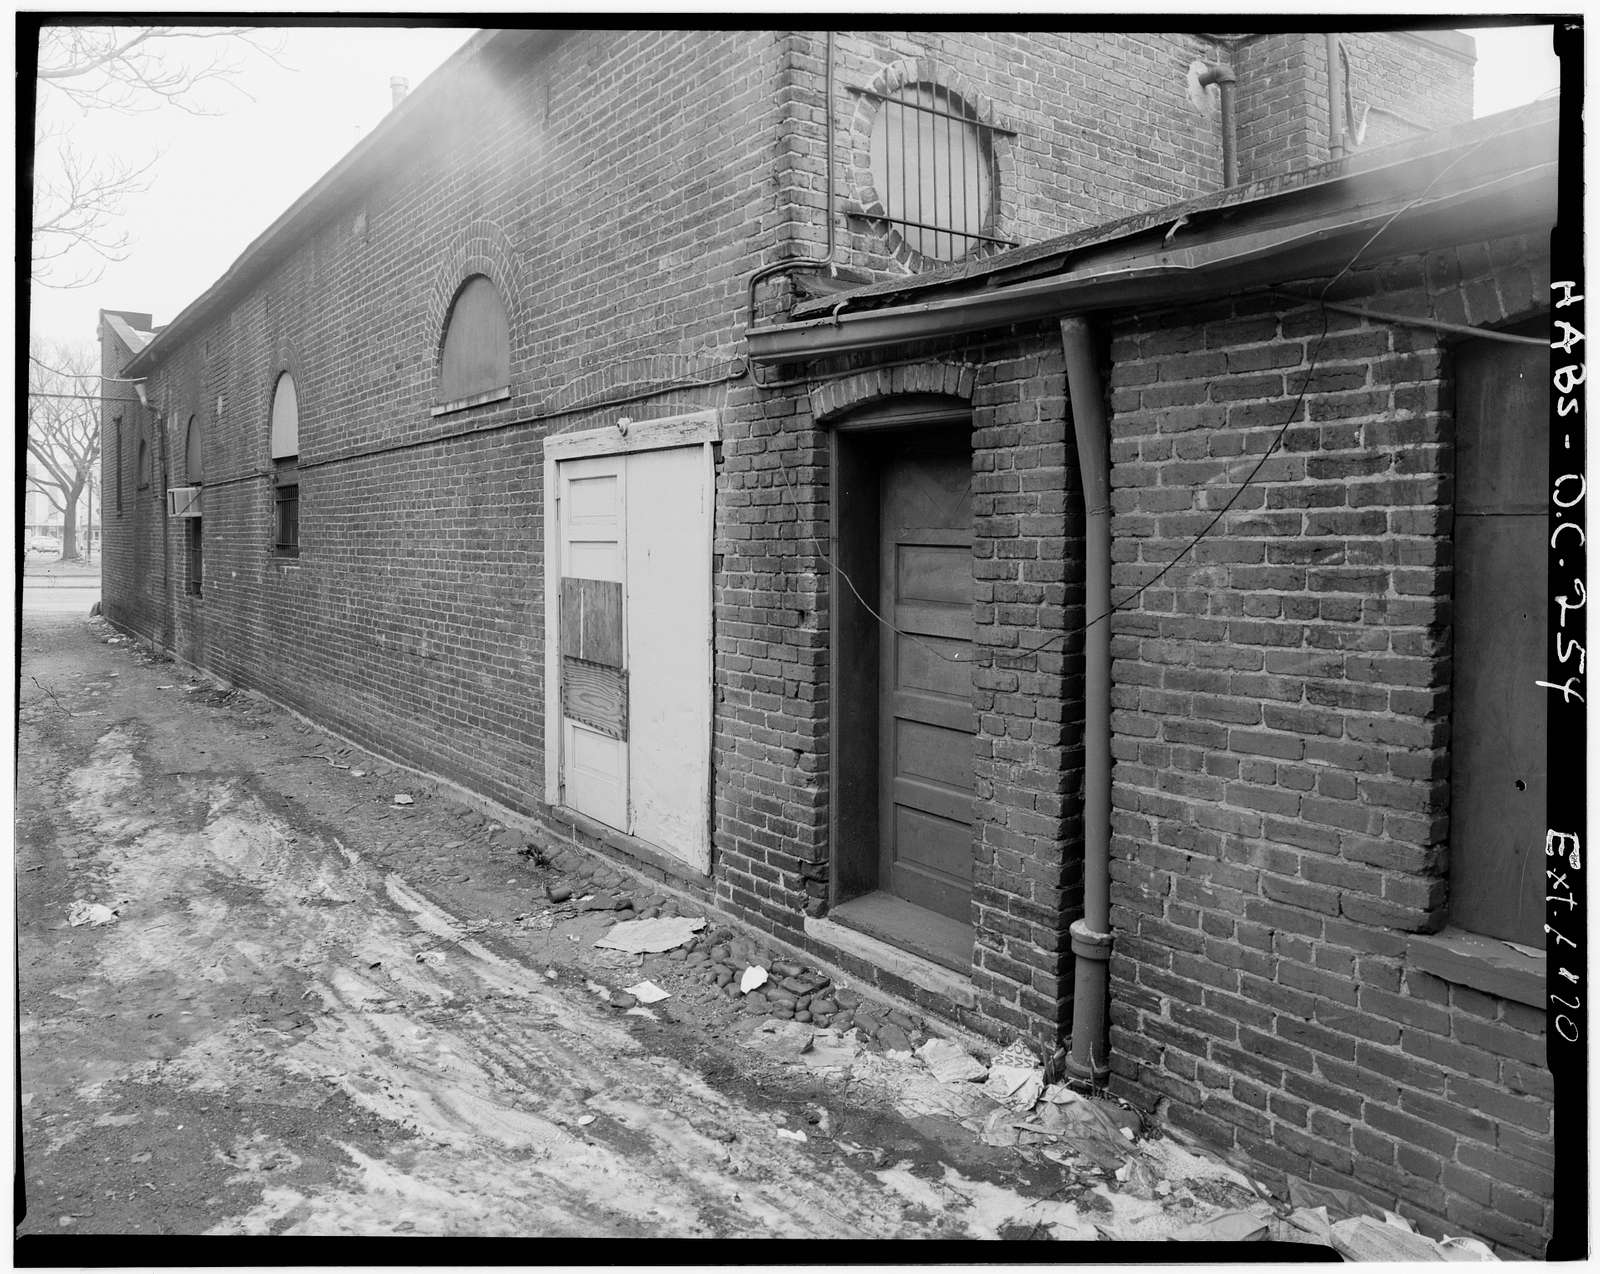 Mount Vernon Theatre, 918 Ninth Street Northwest, Washington, District of Columbia, DC